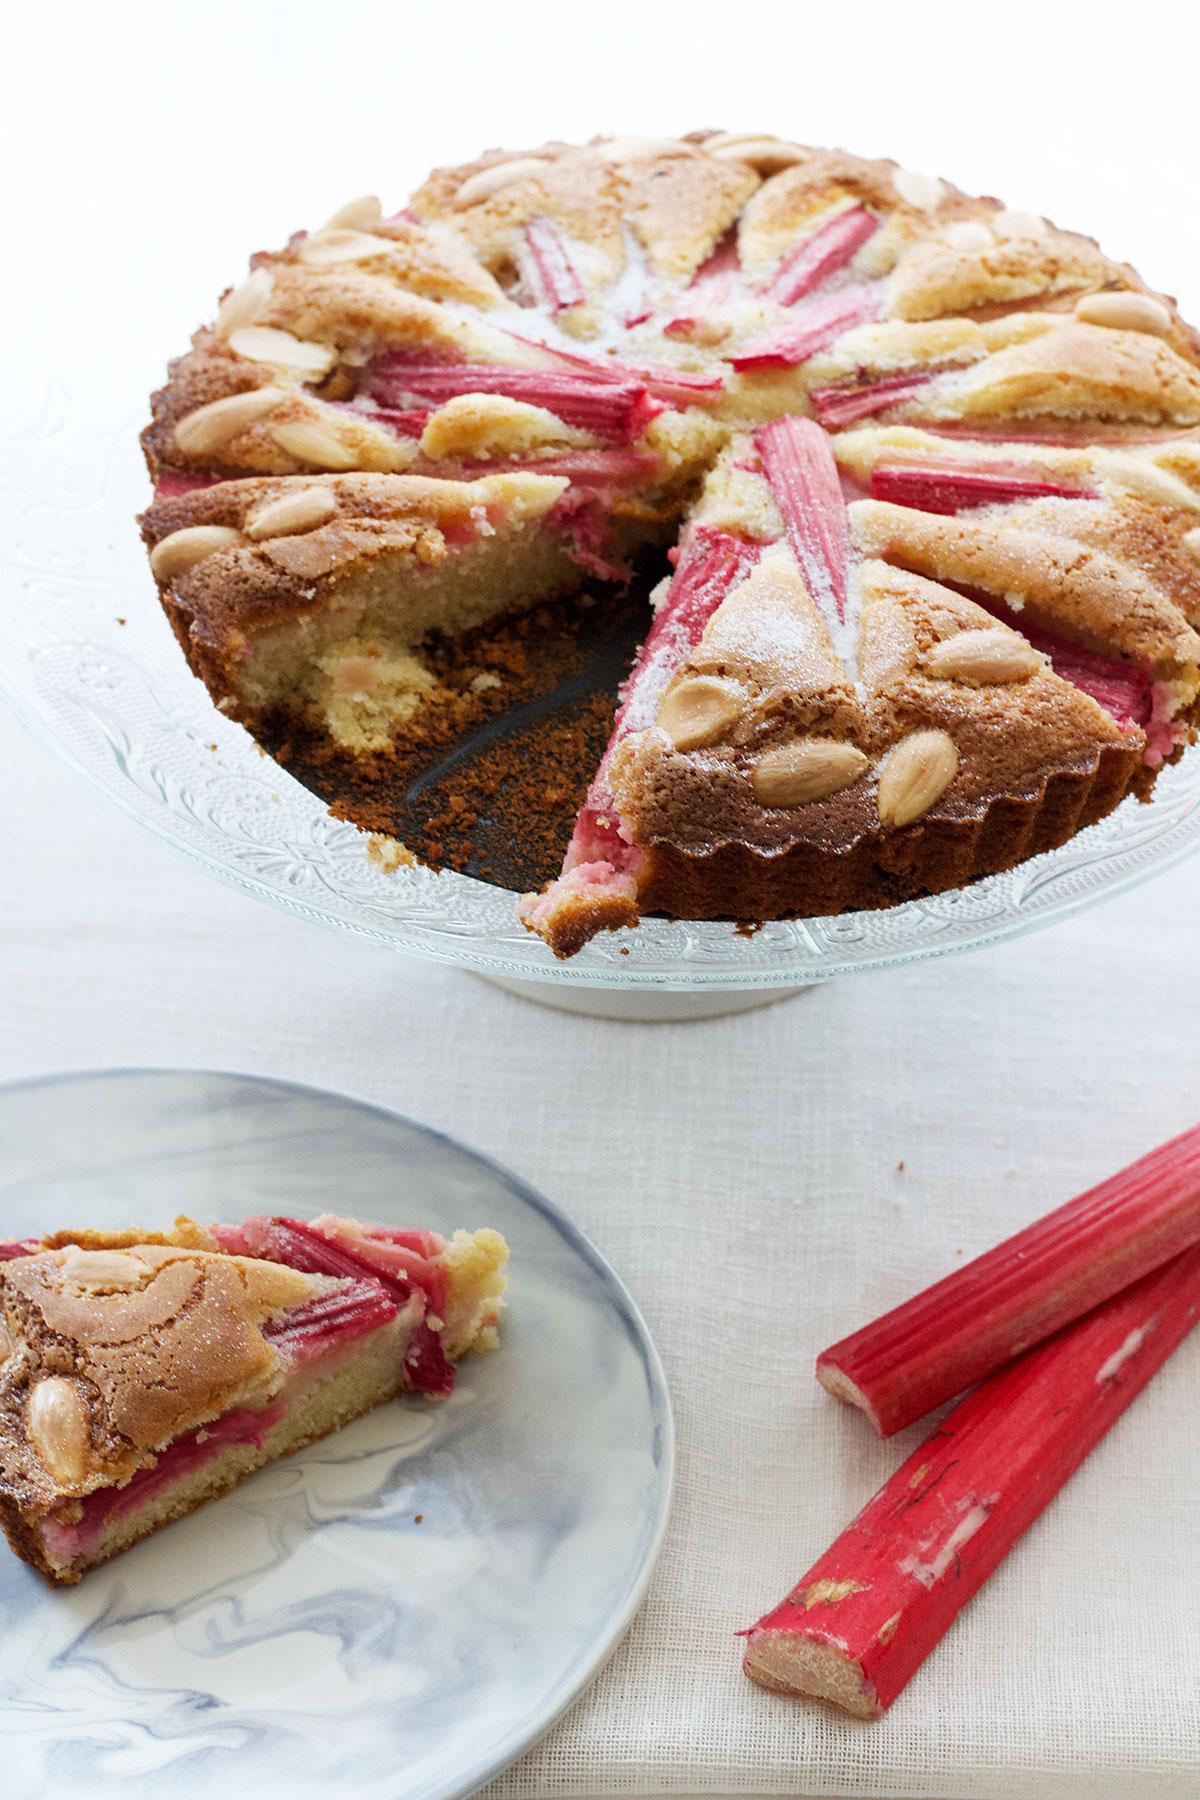 Gluten Free Rhubarb and Almond Cake